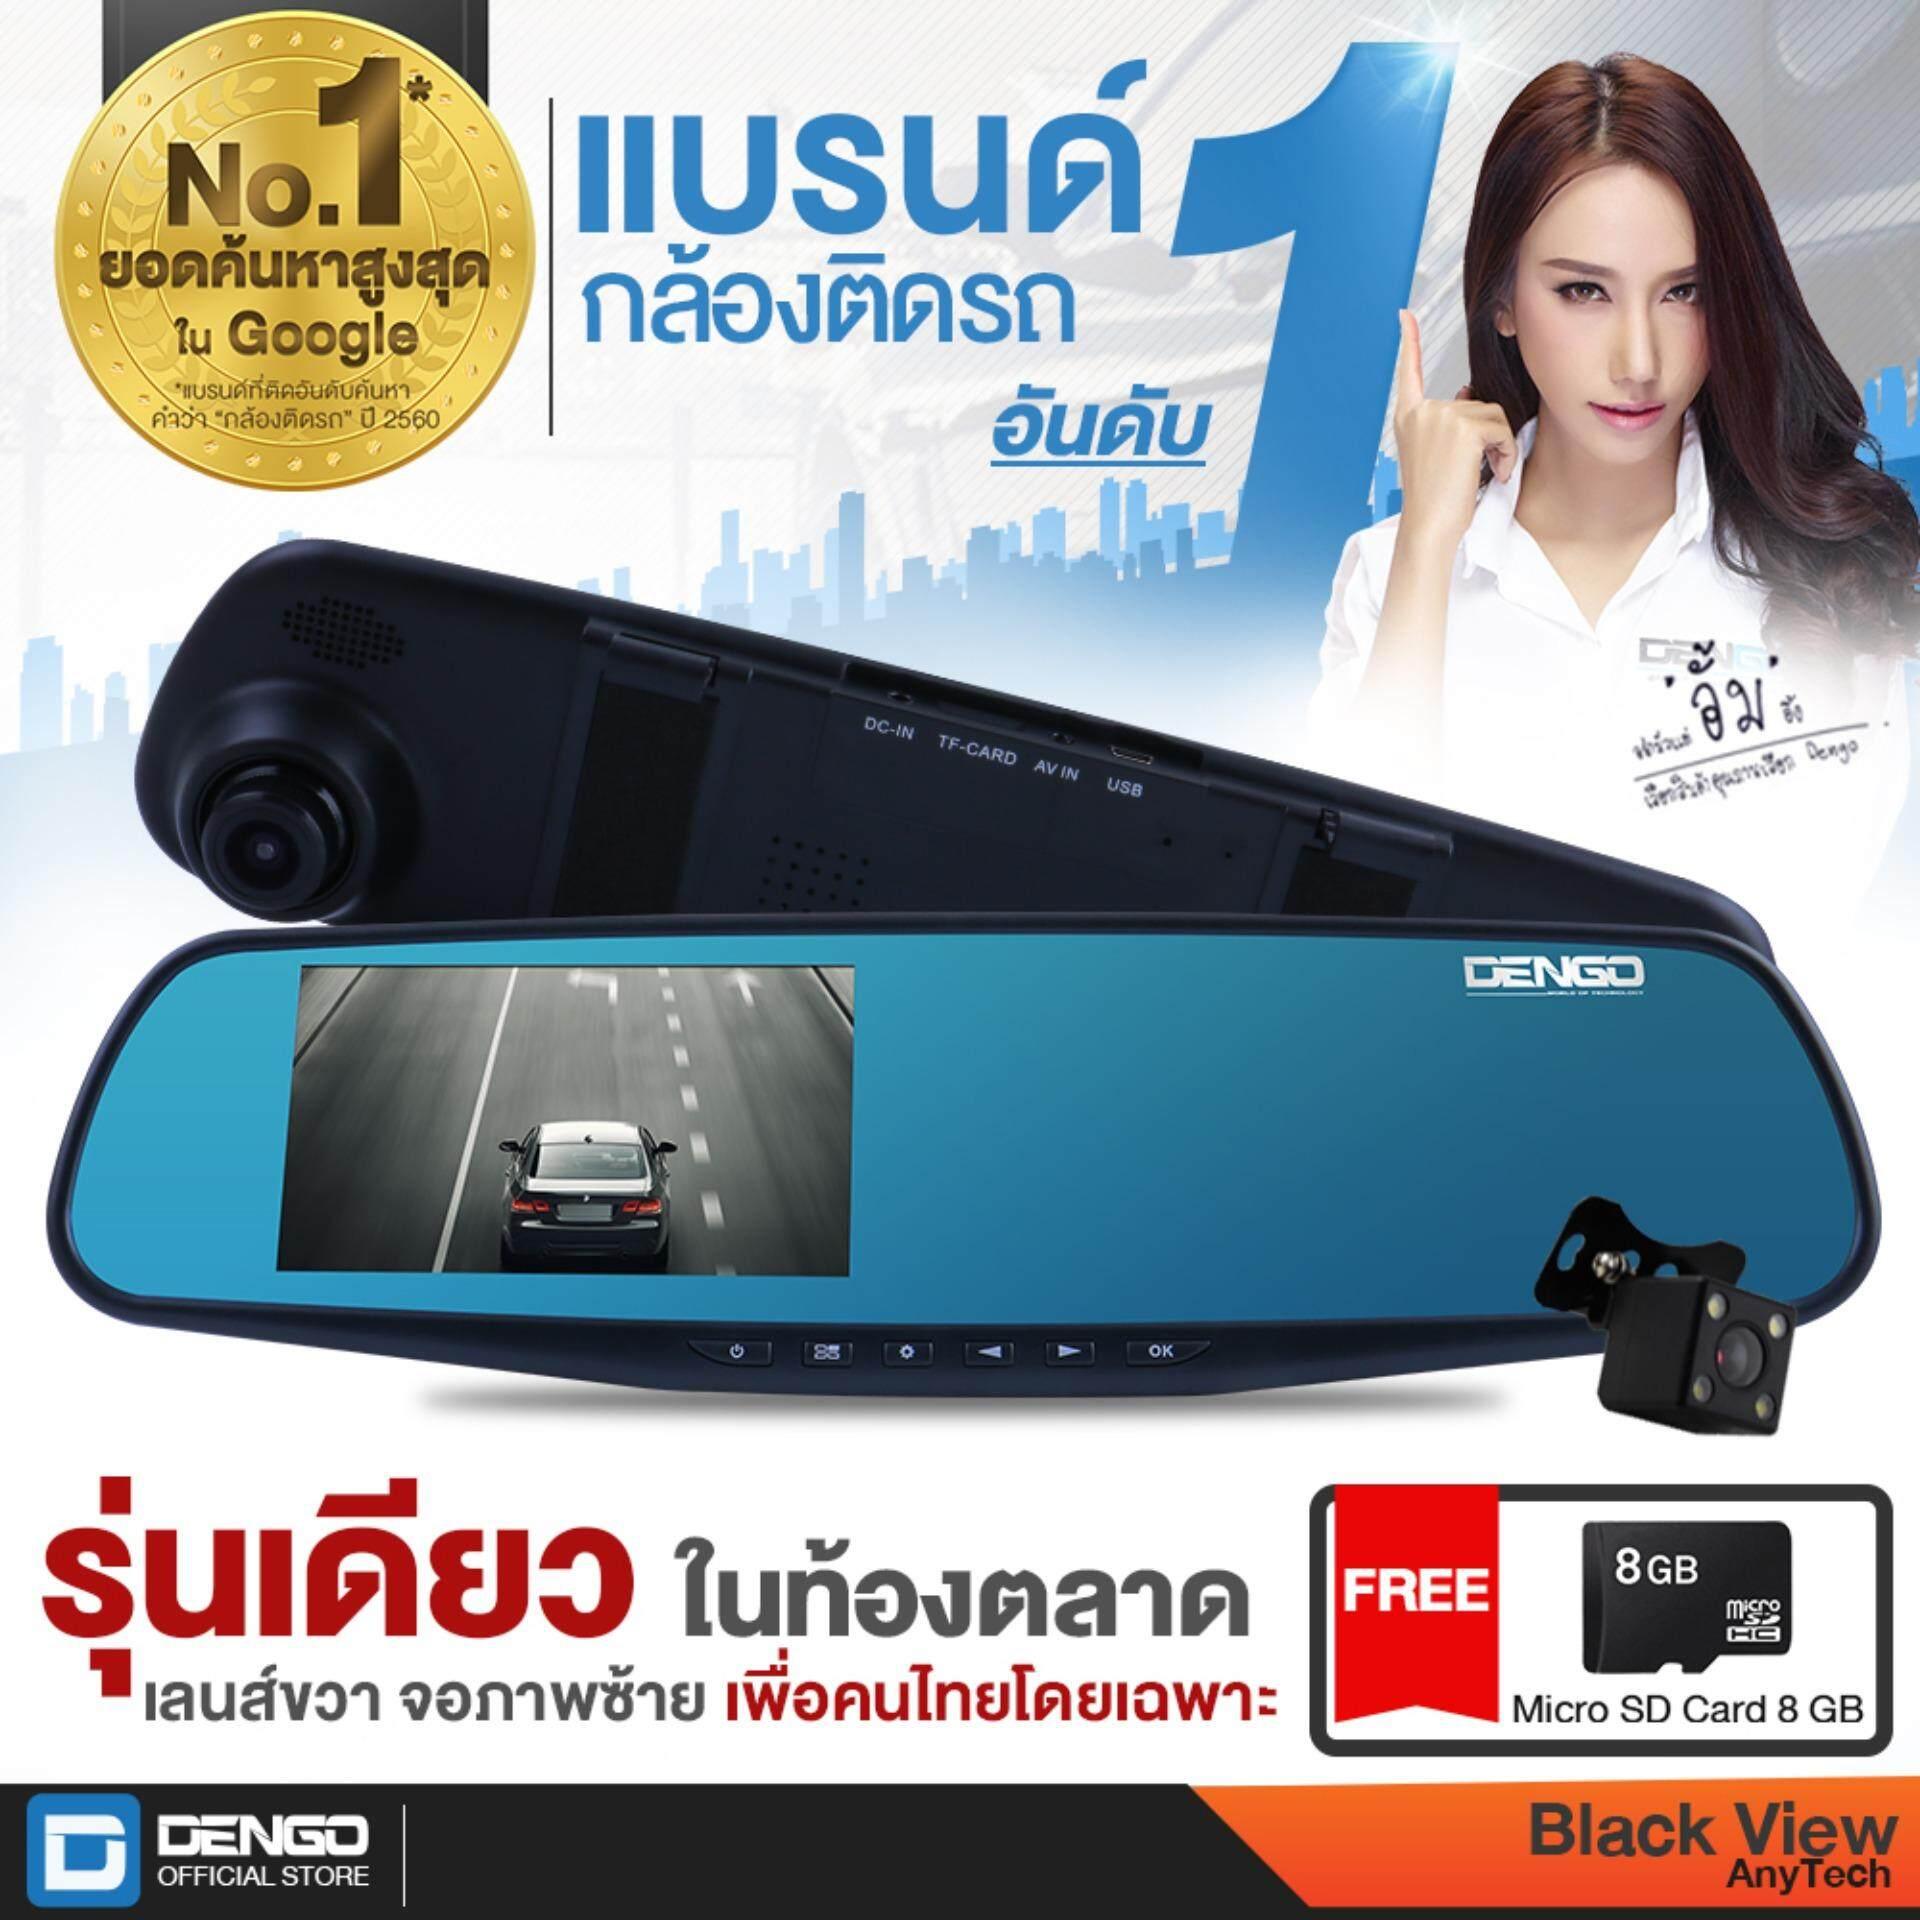 DENGO Black View Anytech กล้องติดรถยนต์ที่รองรับการใช้งาน การขับรถพวงมาลัยขวาในไทย แถมฟรี!  Micro SD Card 8 GB มูลค่า 299 บาท